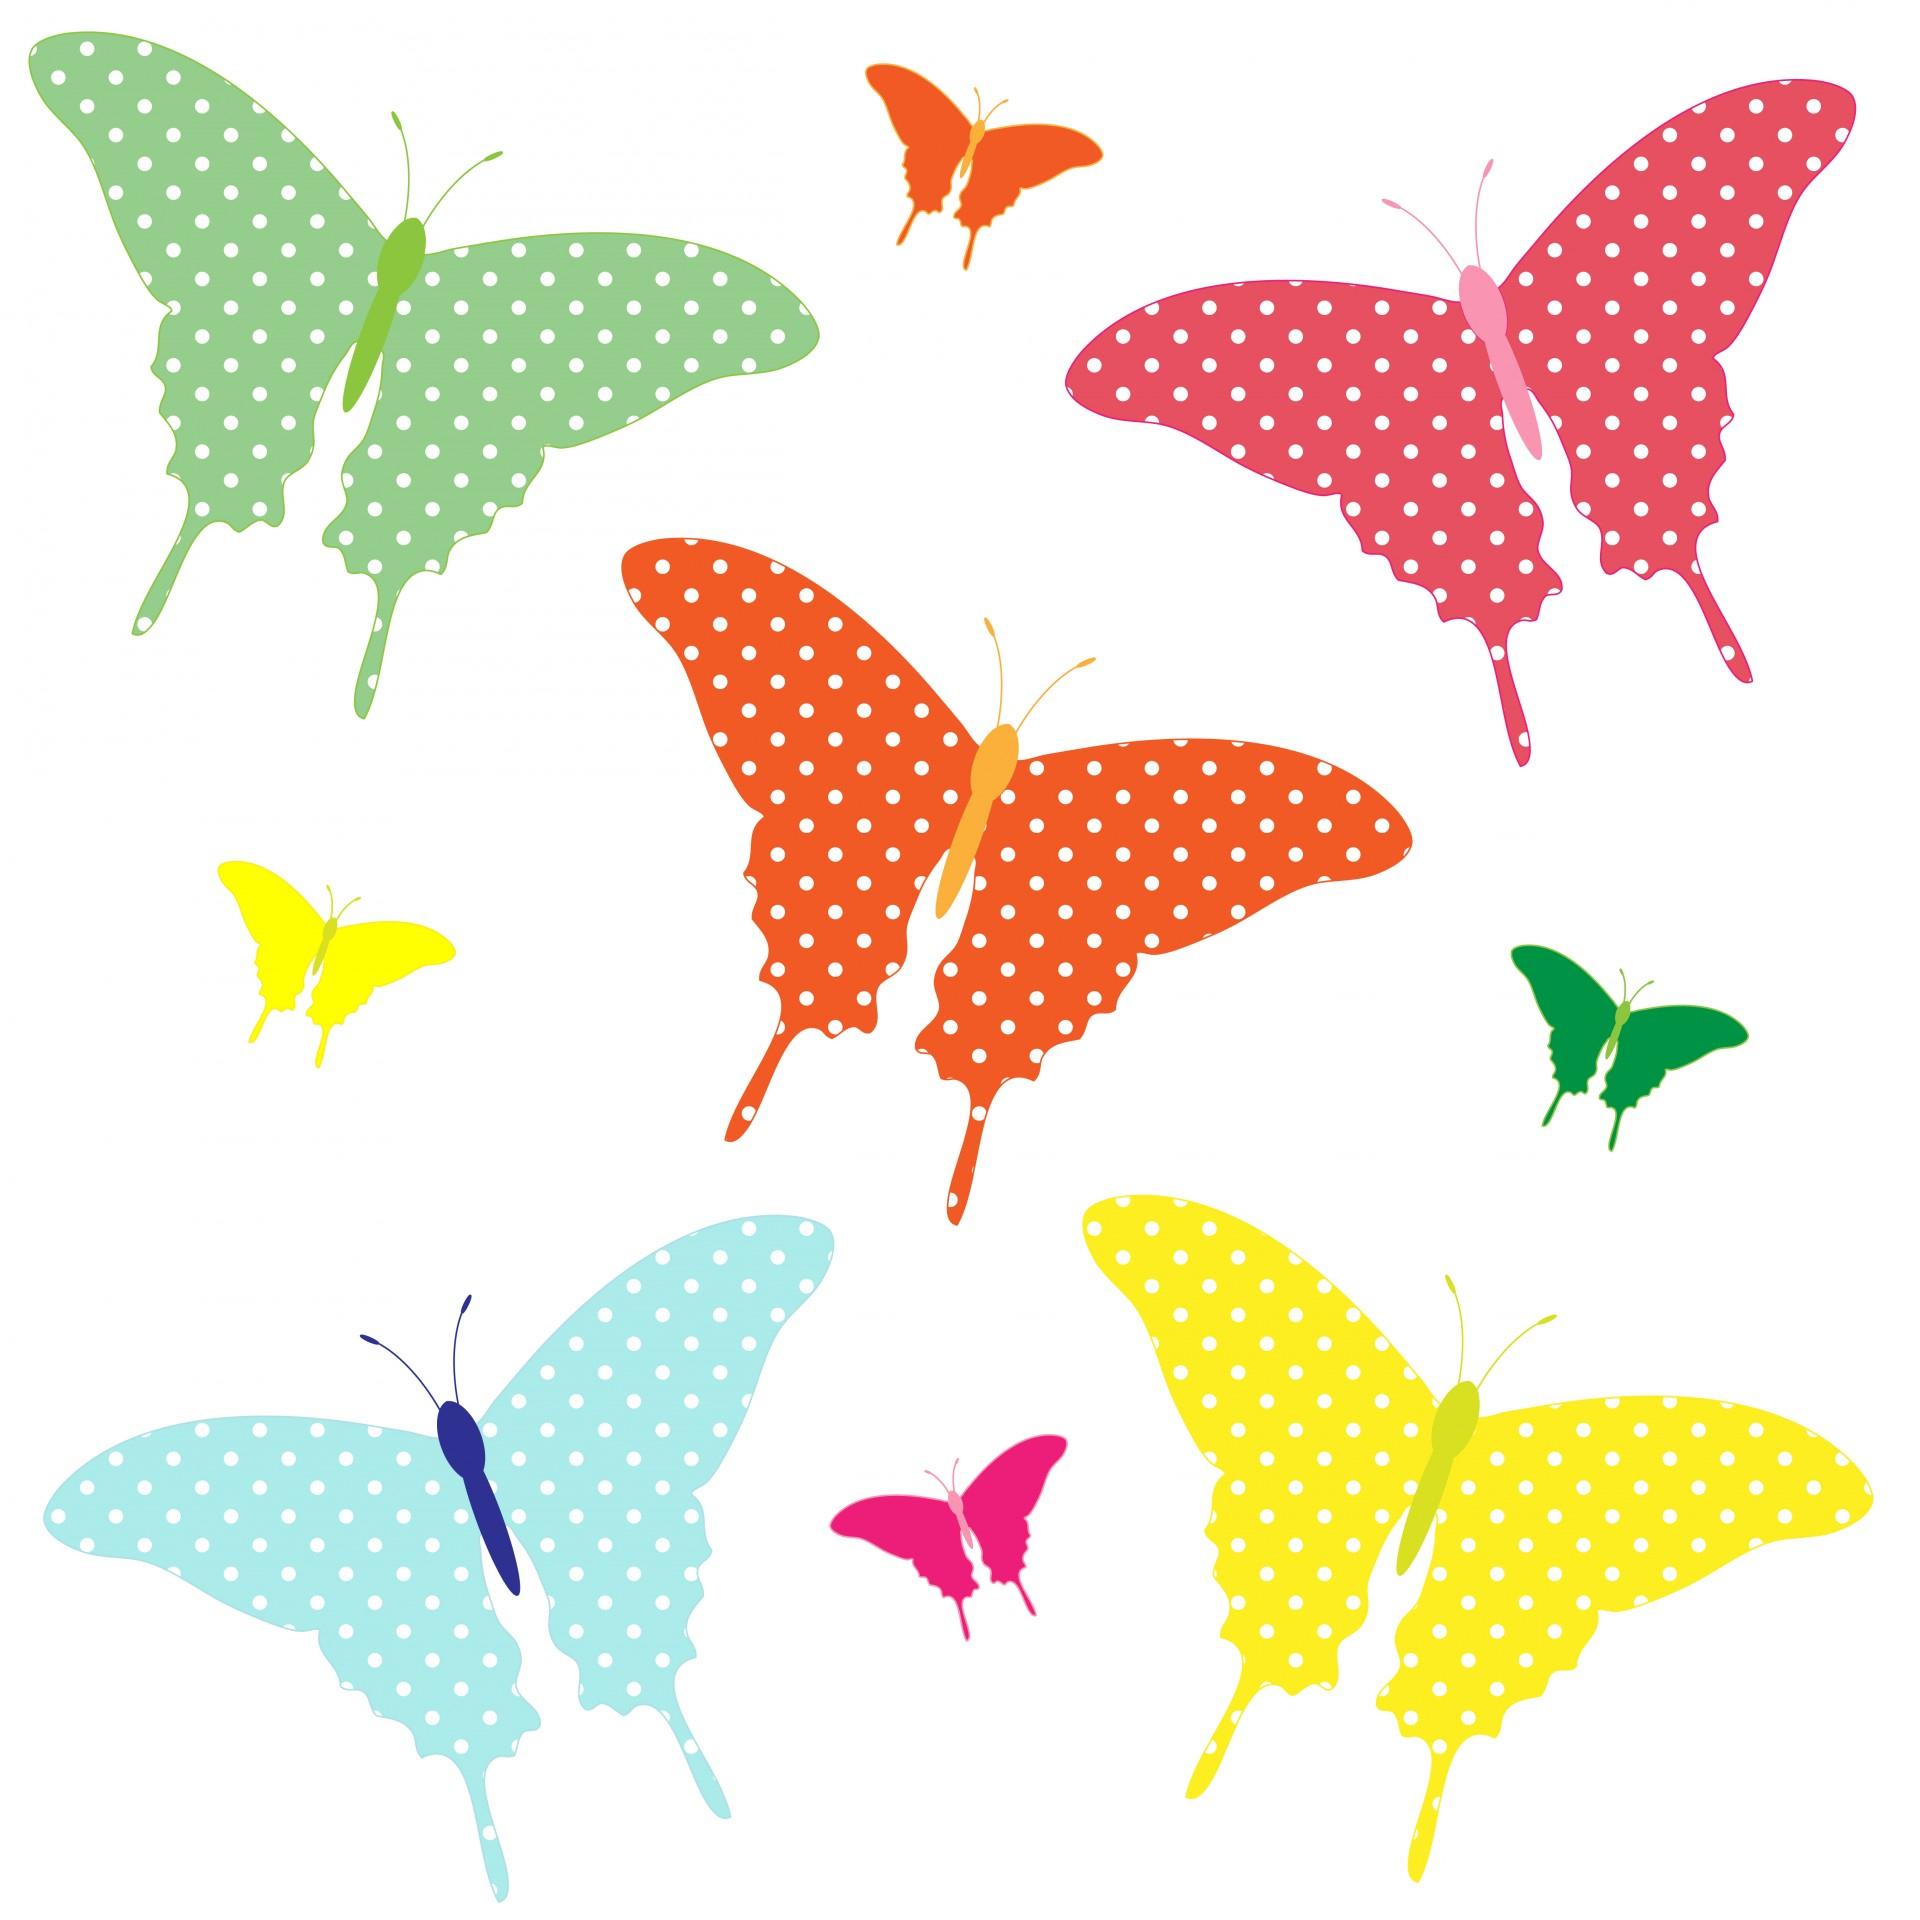 Bunte Schmetterlinge Clipart Kostenloses Stock Bild - Public für Schmetterlinge Clipart